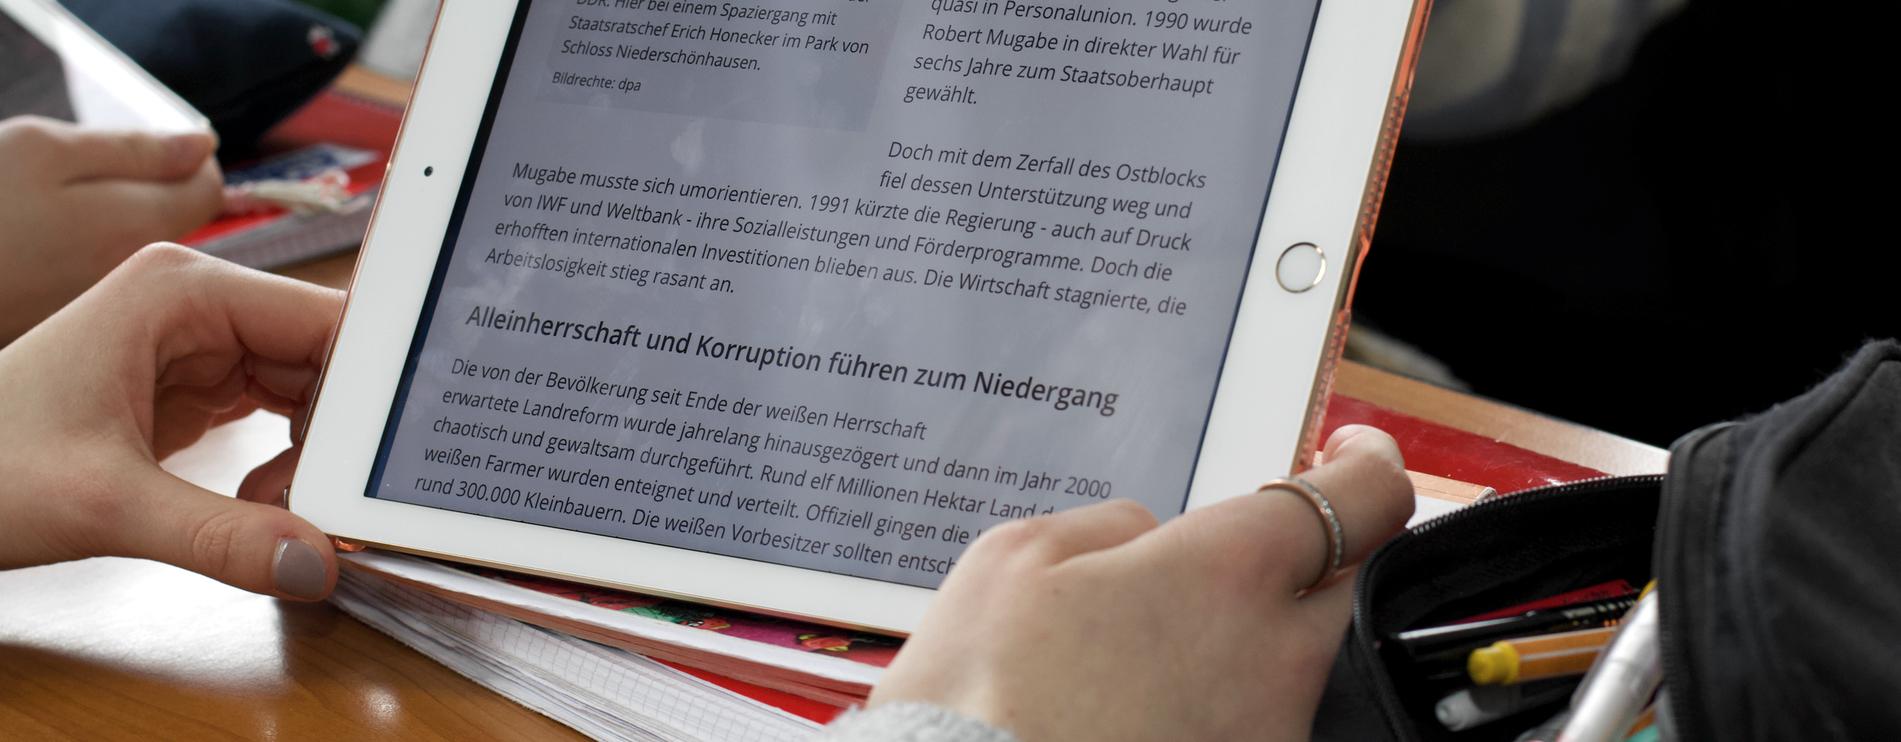 iPad-Klassen